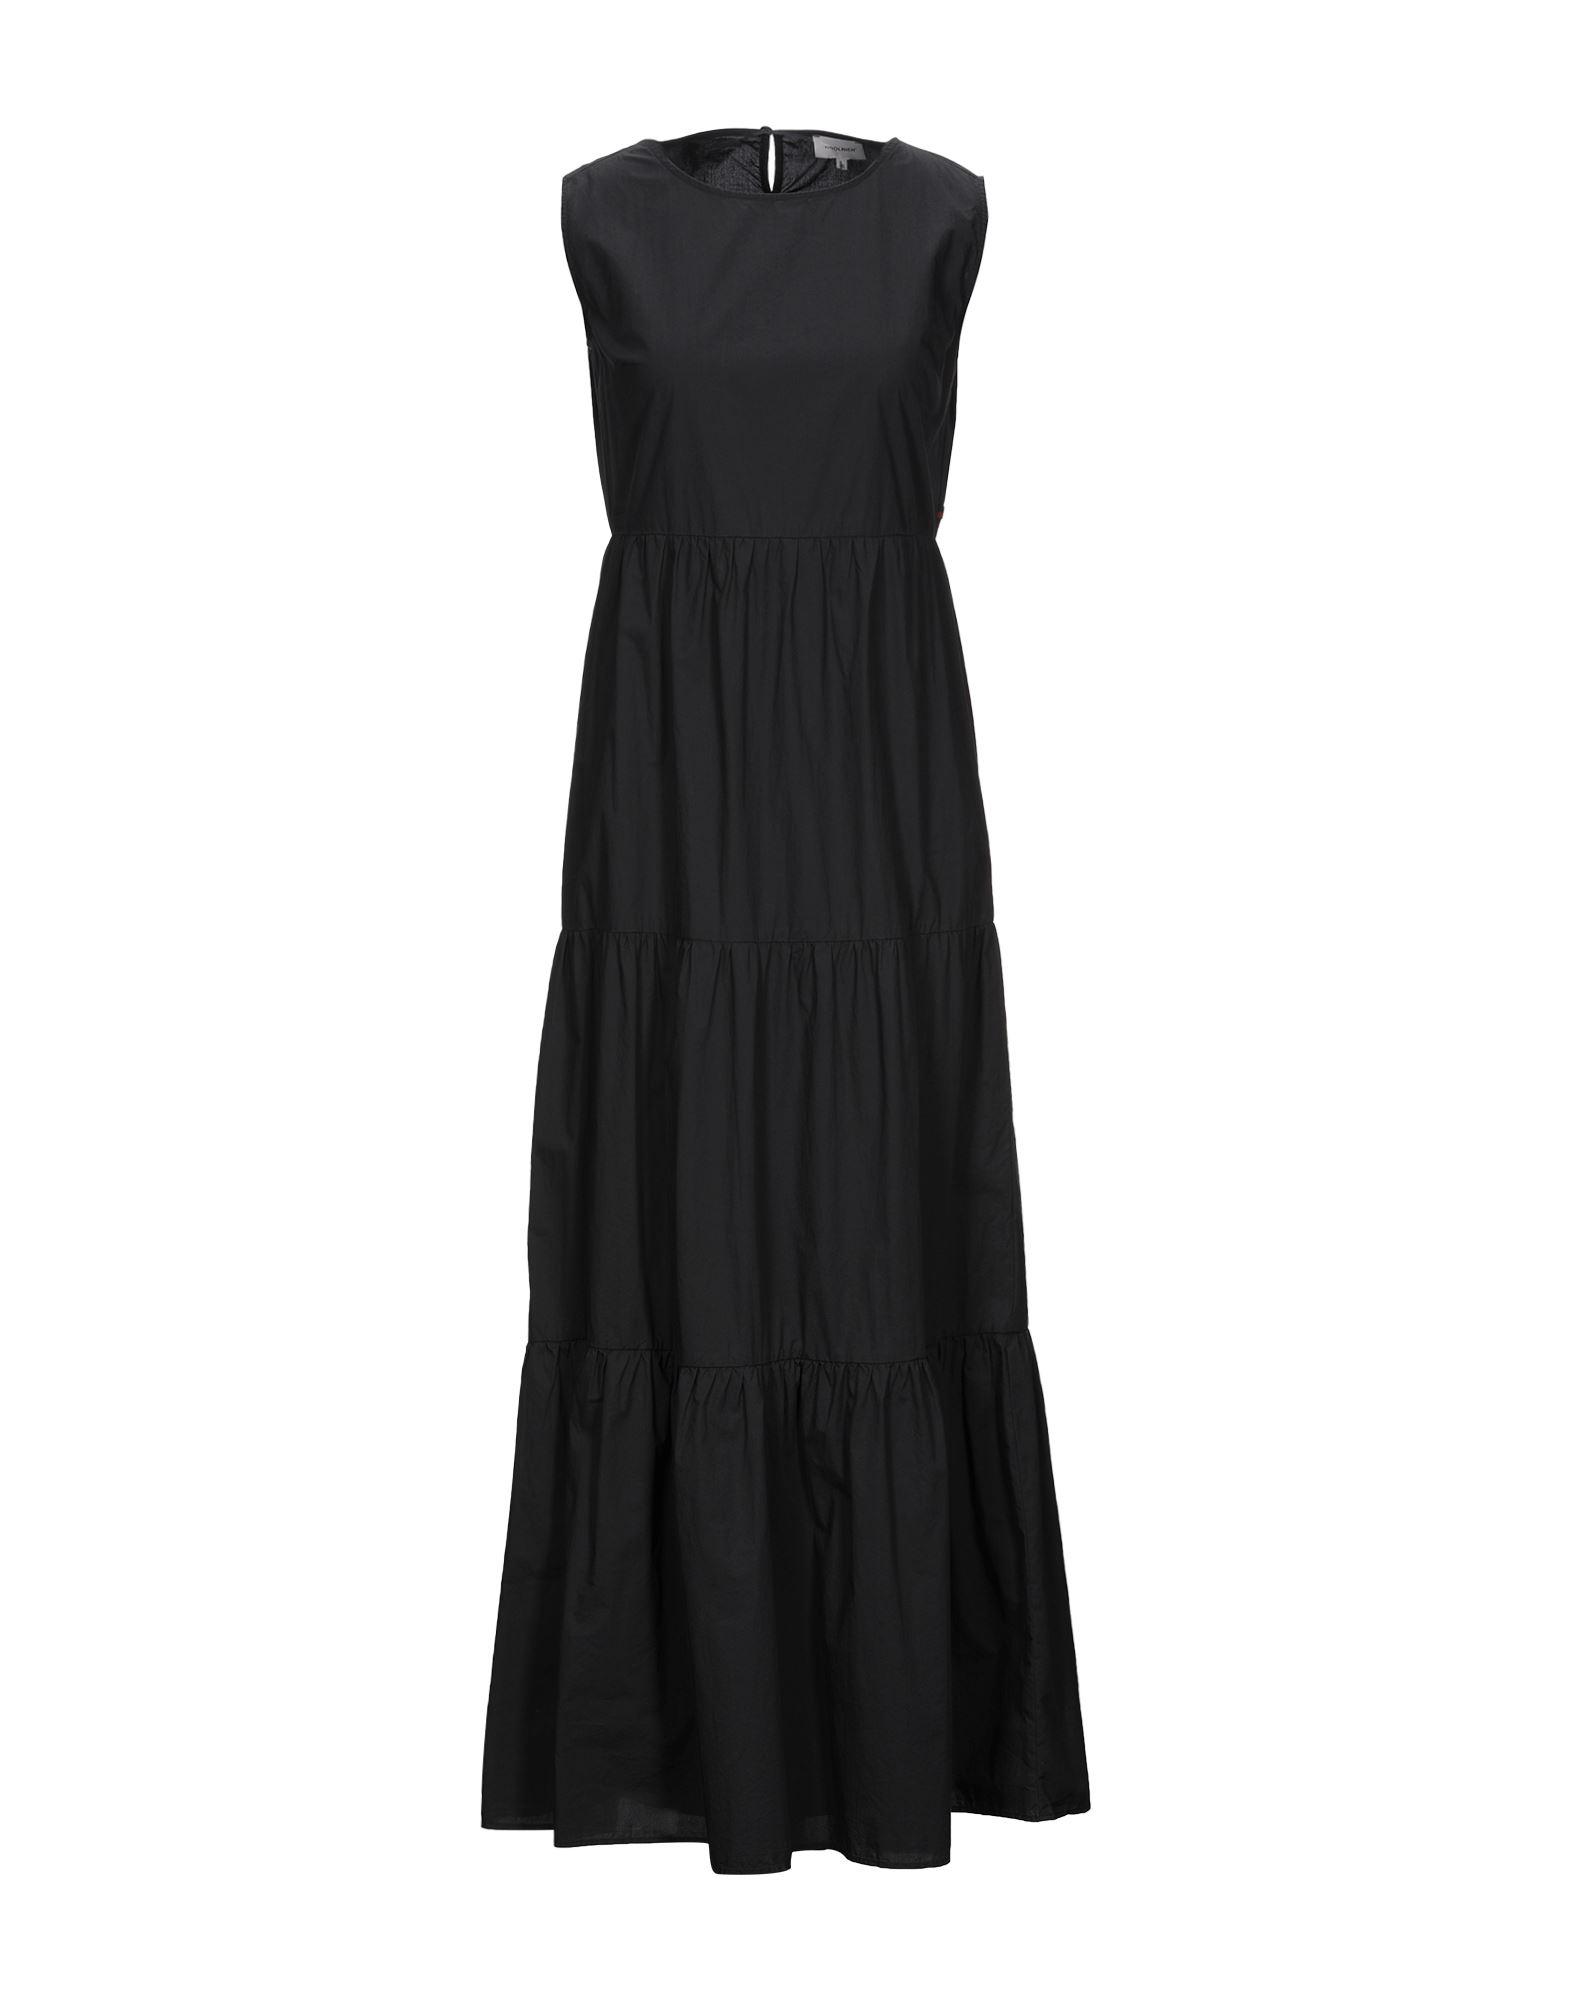 Фото - WOOLRICH Длинное платье woolrich топ без рукавов